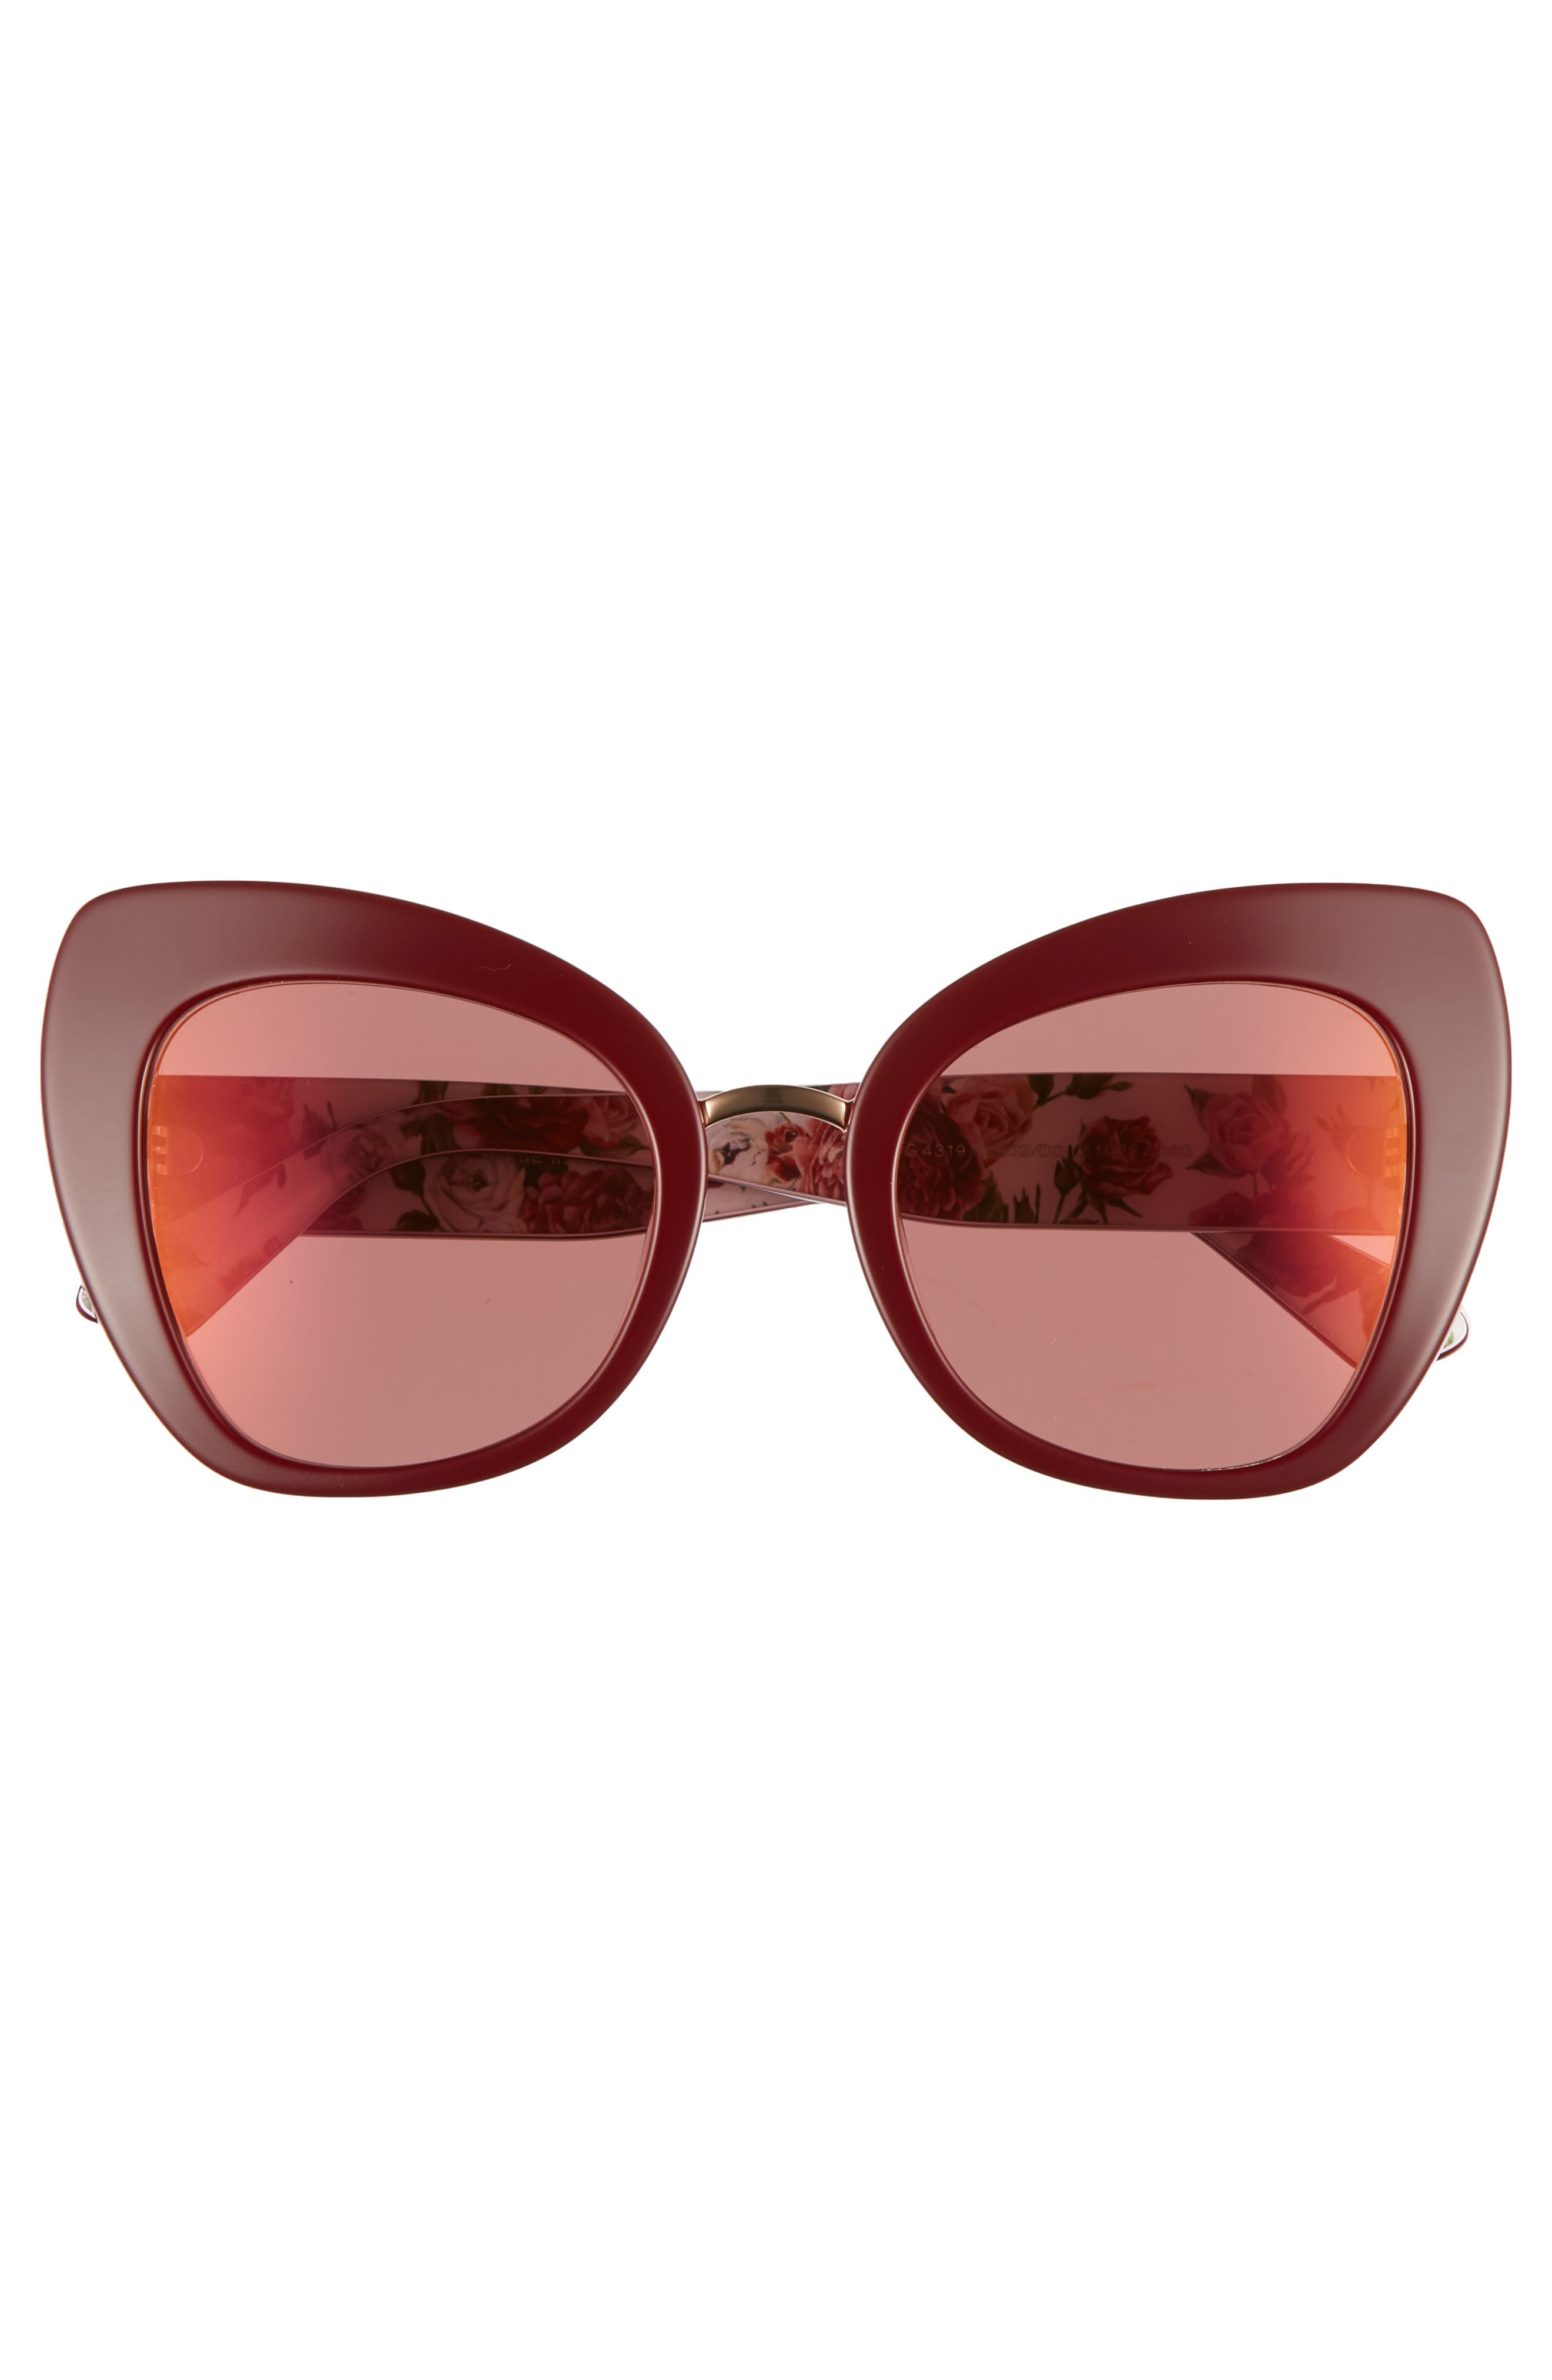 51mm Mirrored Cat Eye Sunglasses,                             Alternate thumbnail 3, color,                             PURPLE/ RED MIRROR